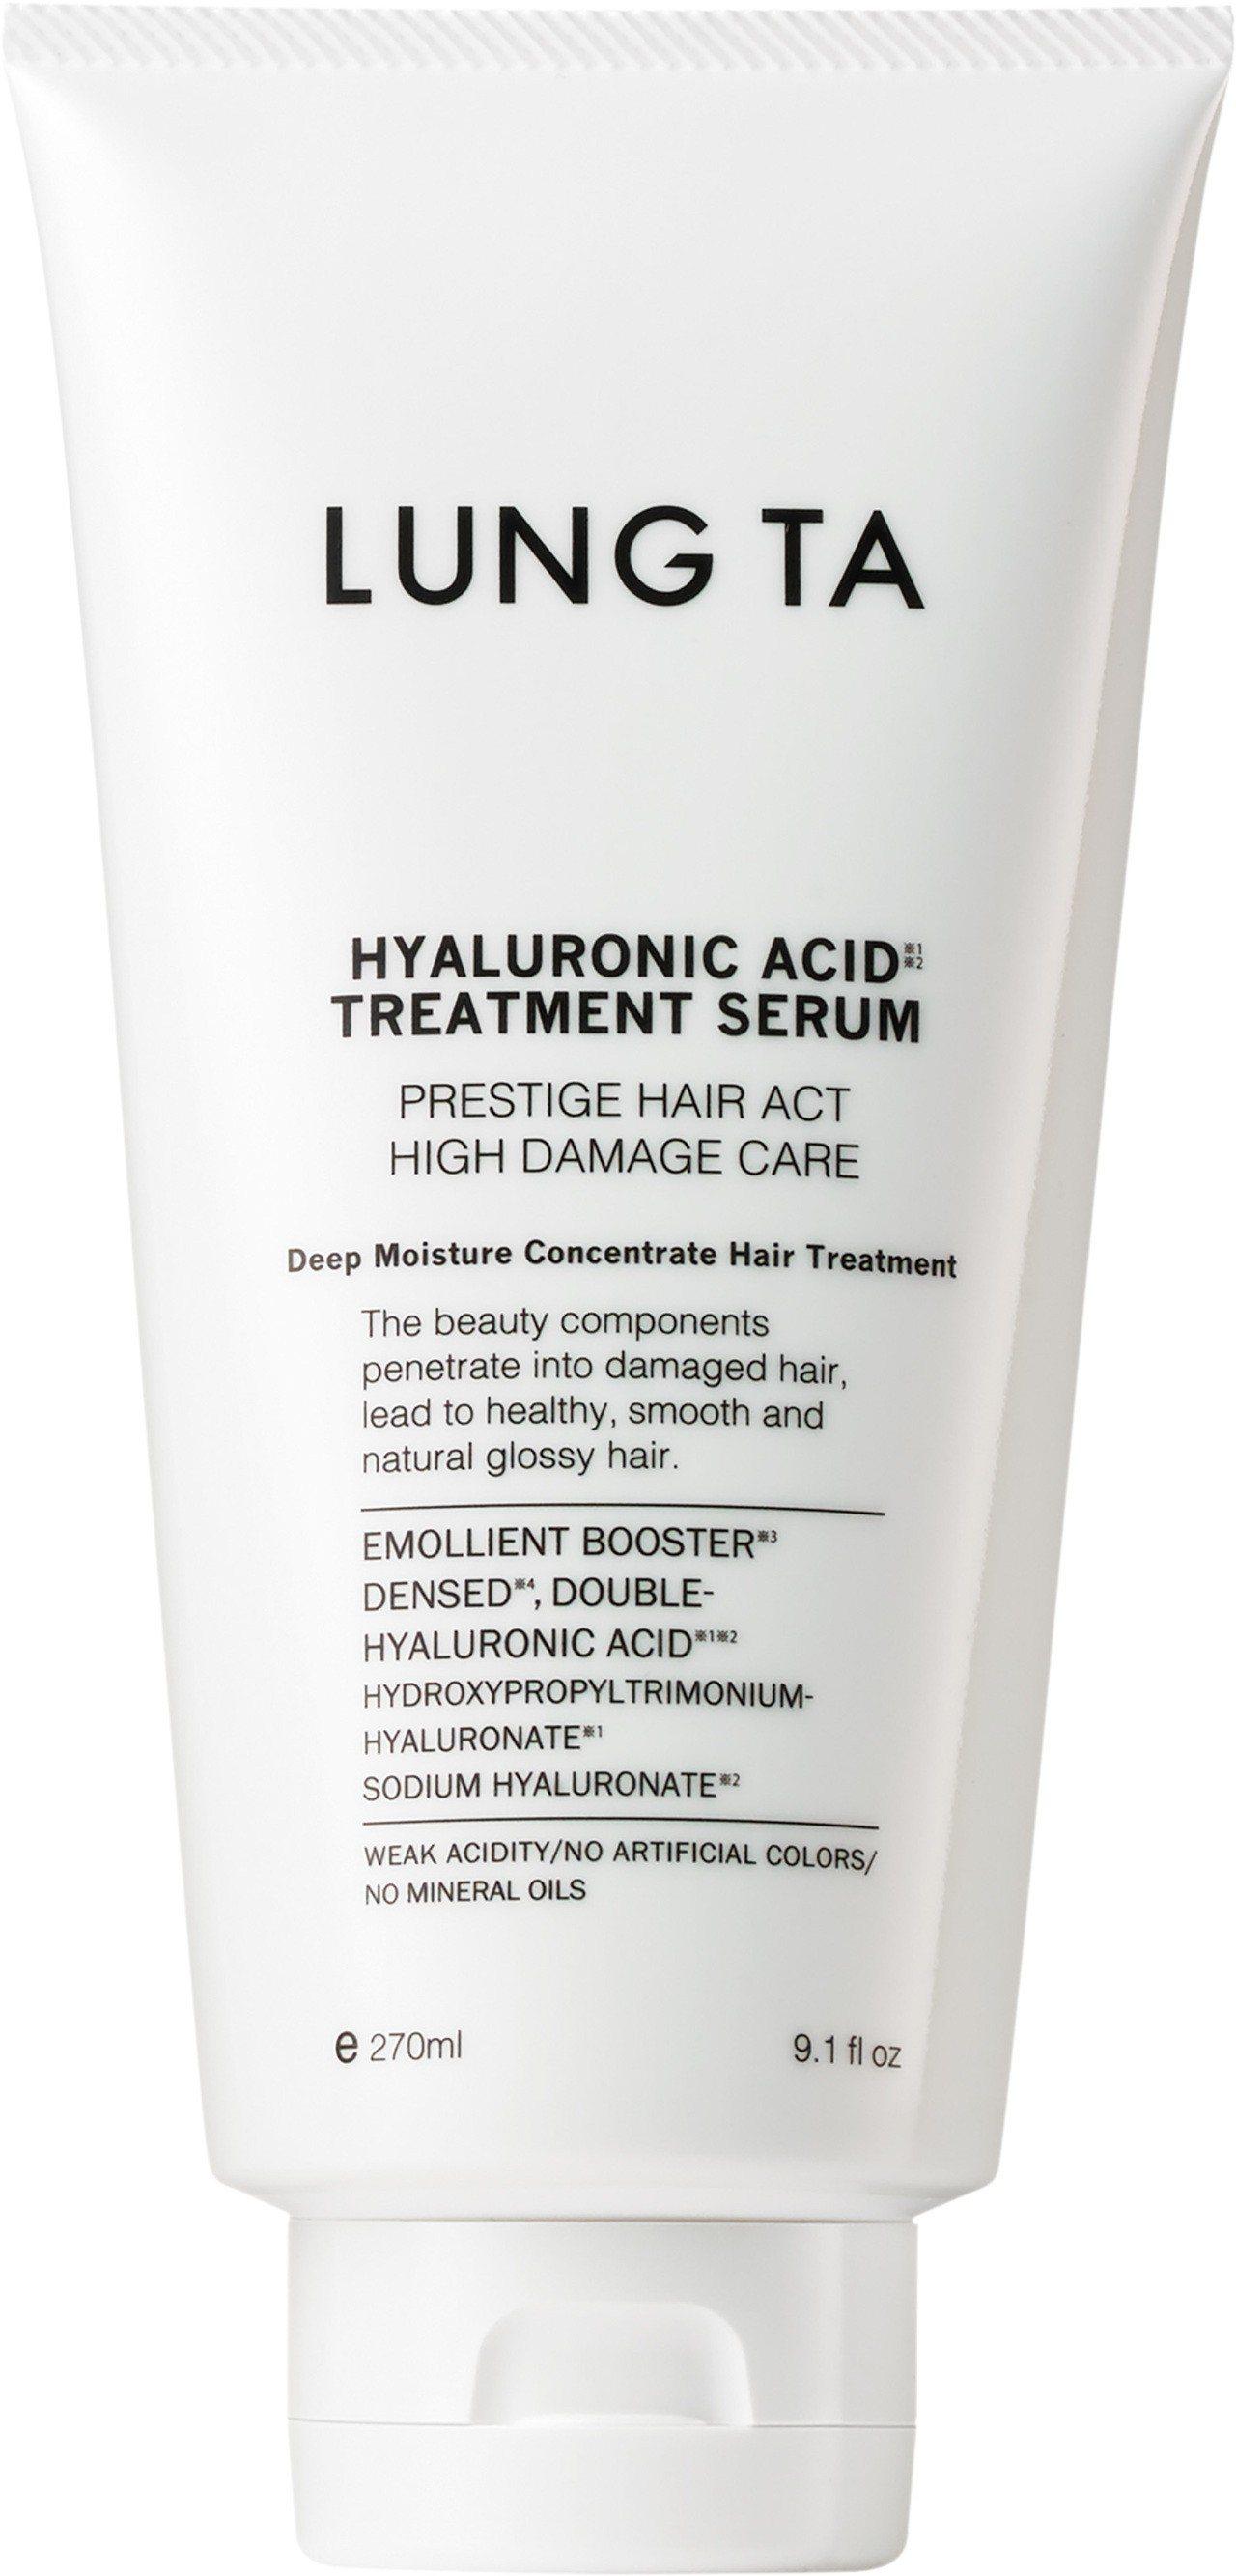 LUNG TA深層保濕胺基酸護髮乳270ml,售價798元。圖/松本清提供